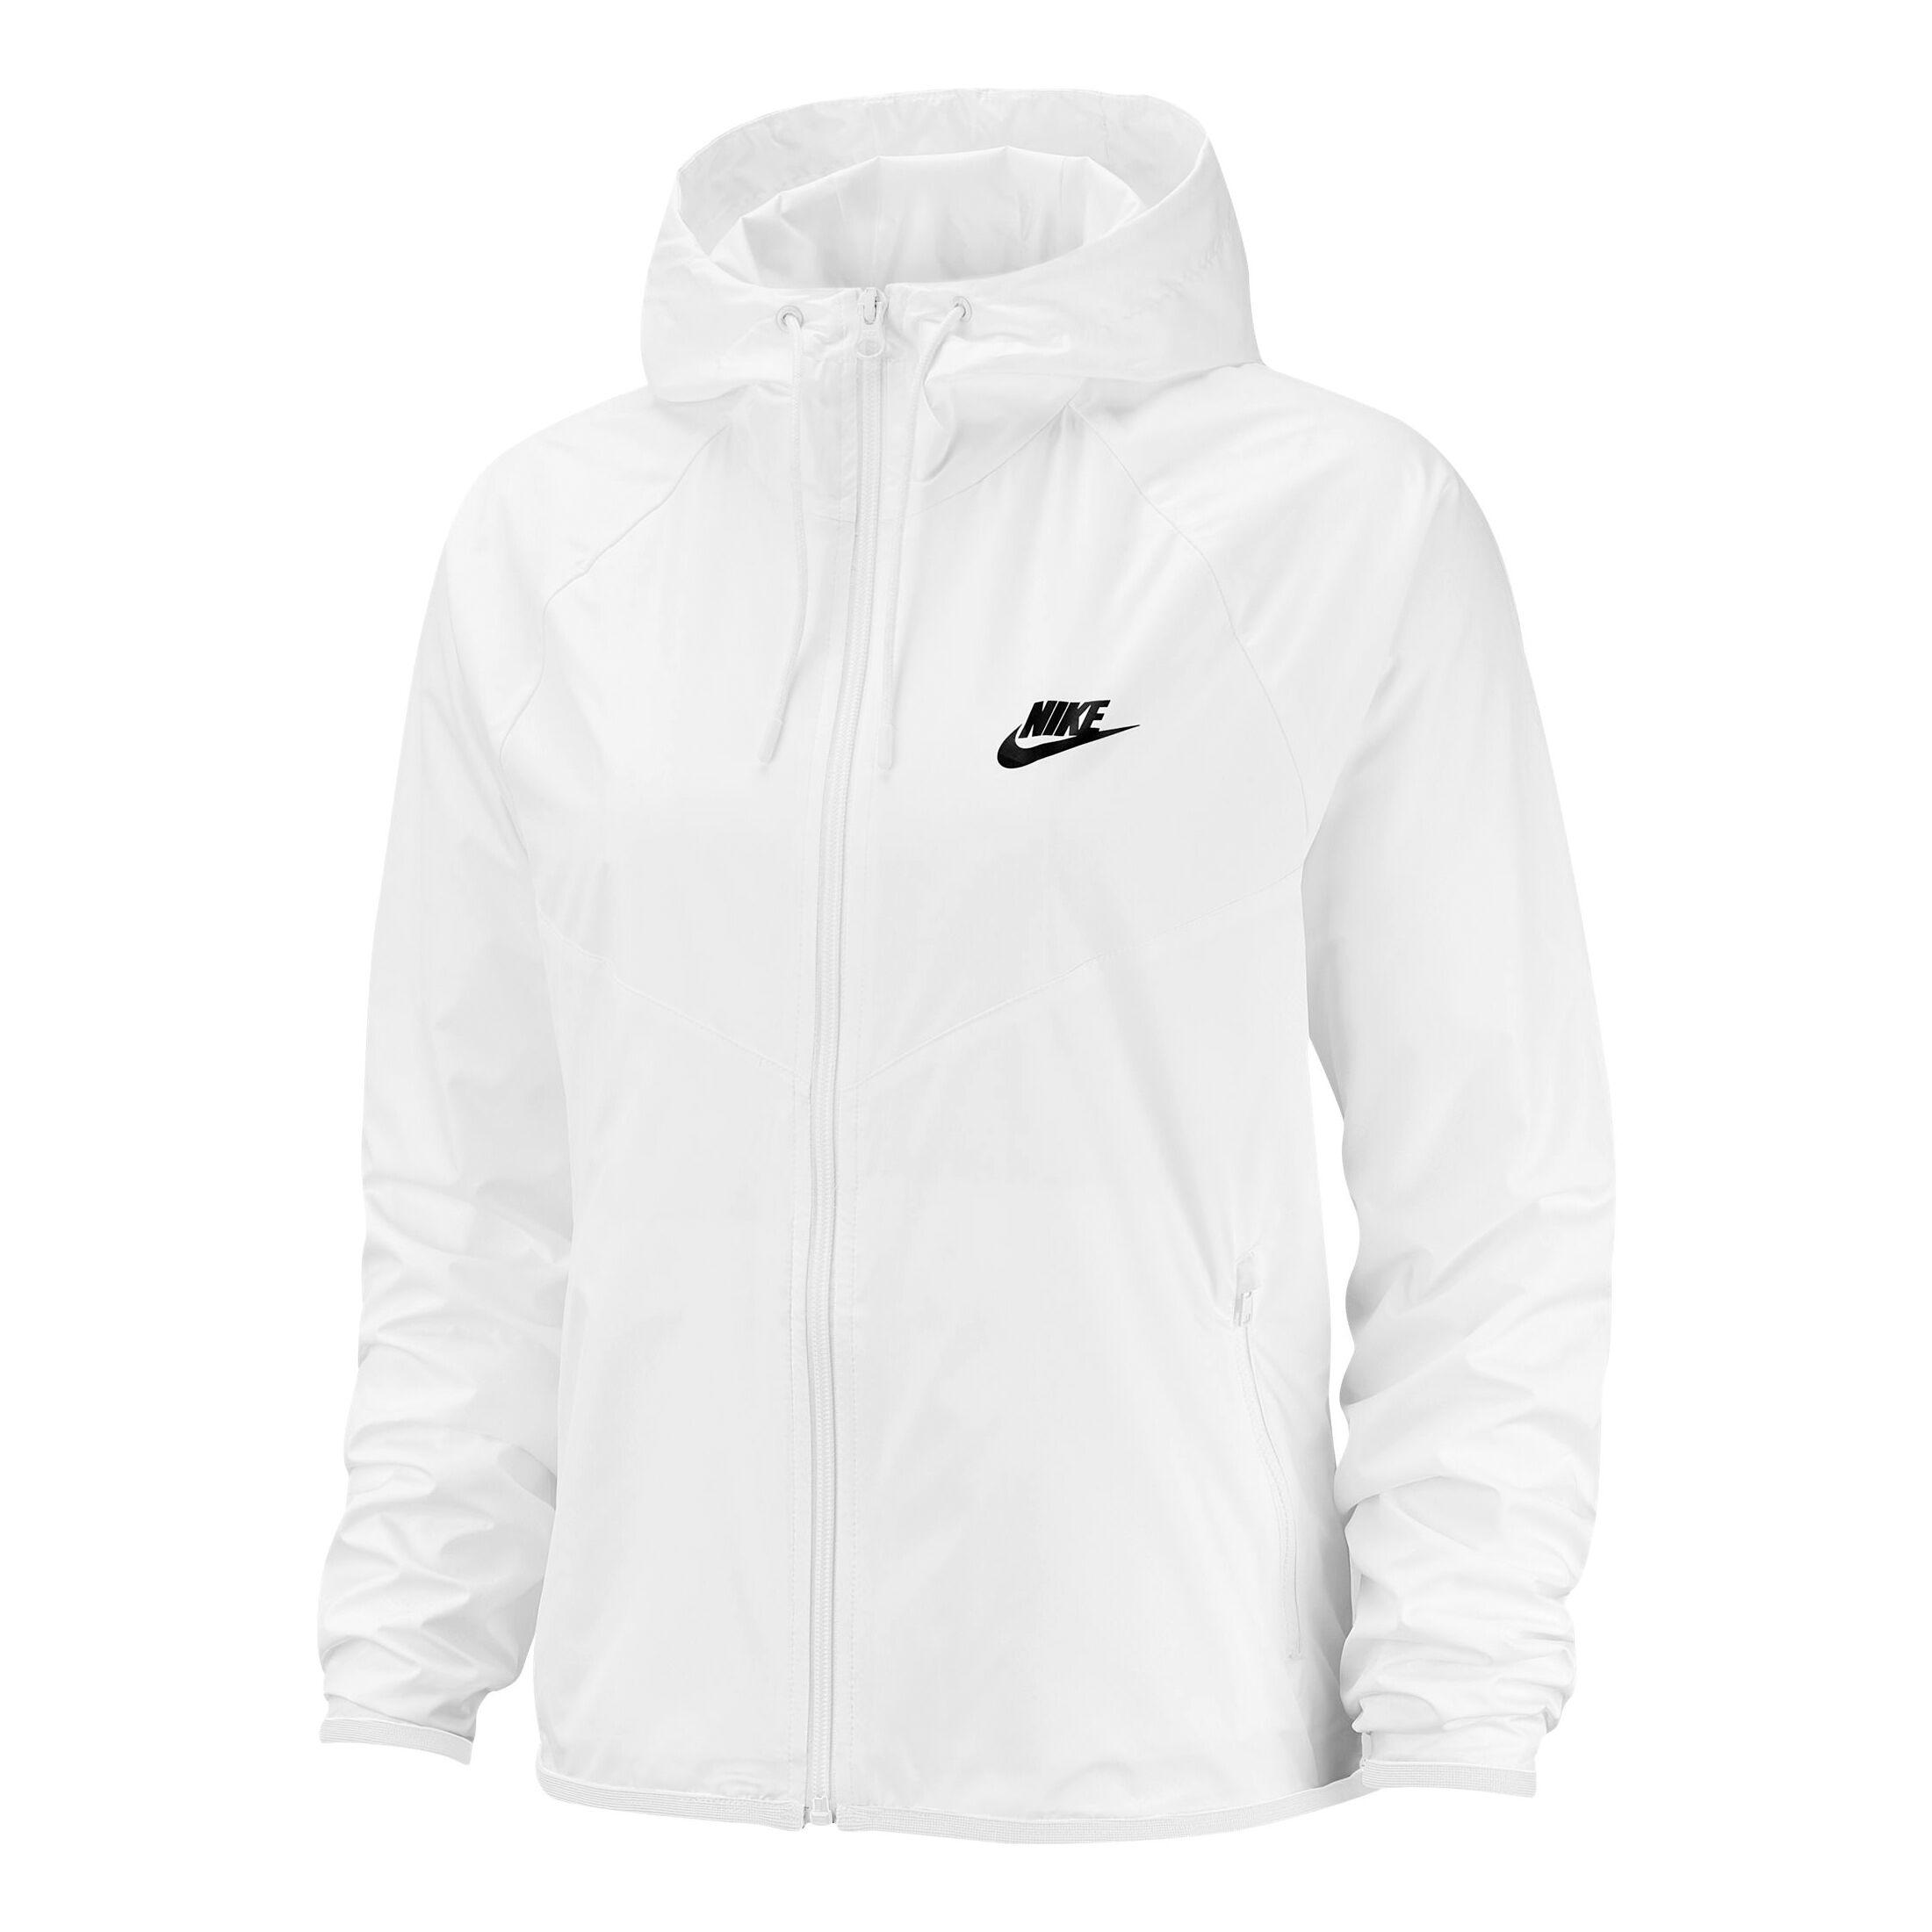 Sportswear Windrunner Veste De Survêtement Femmes Blanc , Noir